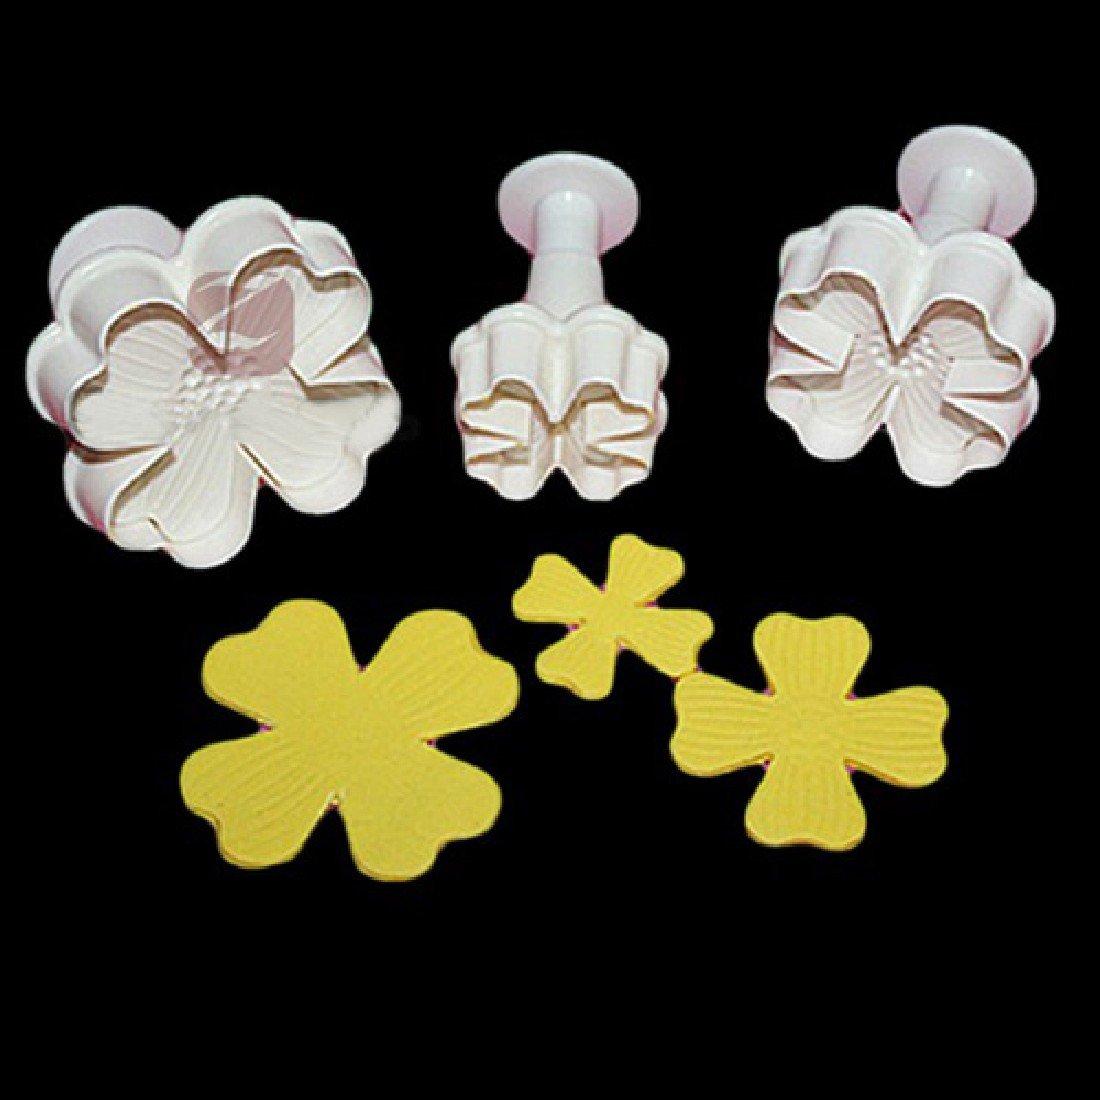 New 3pcs/set Flower Shape Cake Sugarcraft Plunger Decoration Diy Tool Mold Kitchen Accessories by Joylive (Image #3)